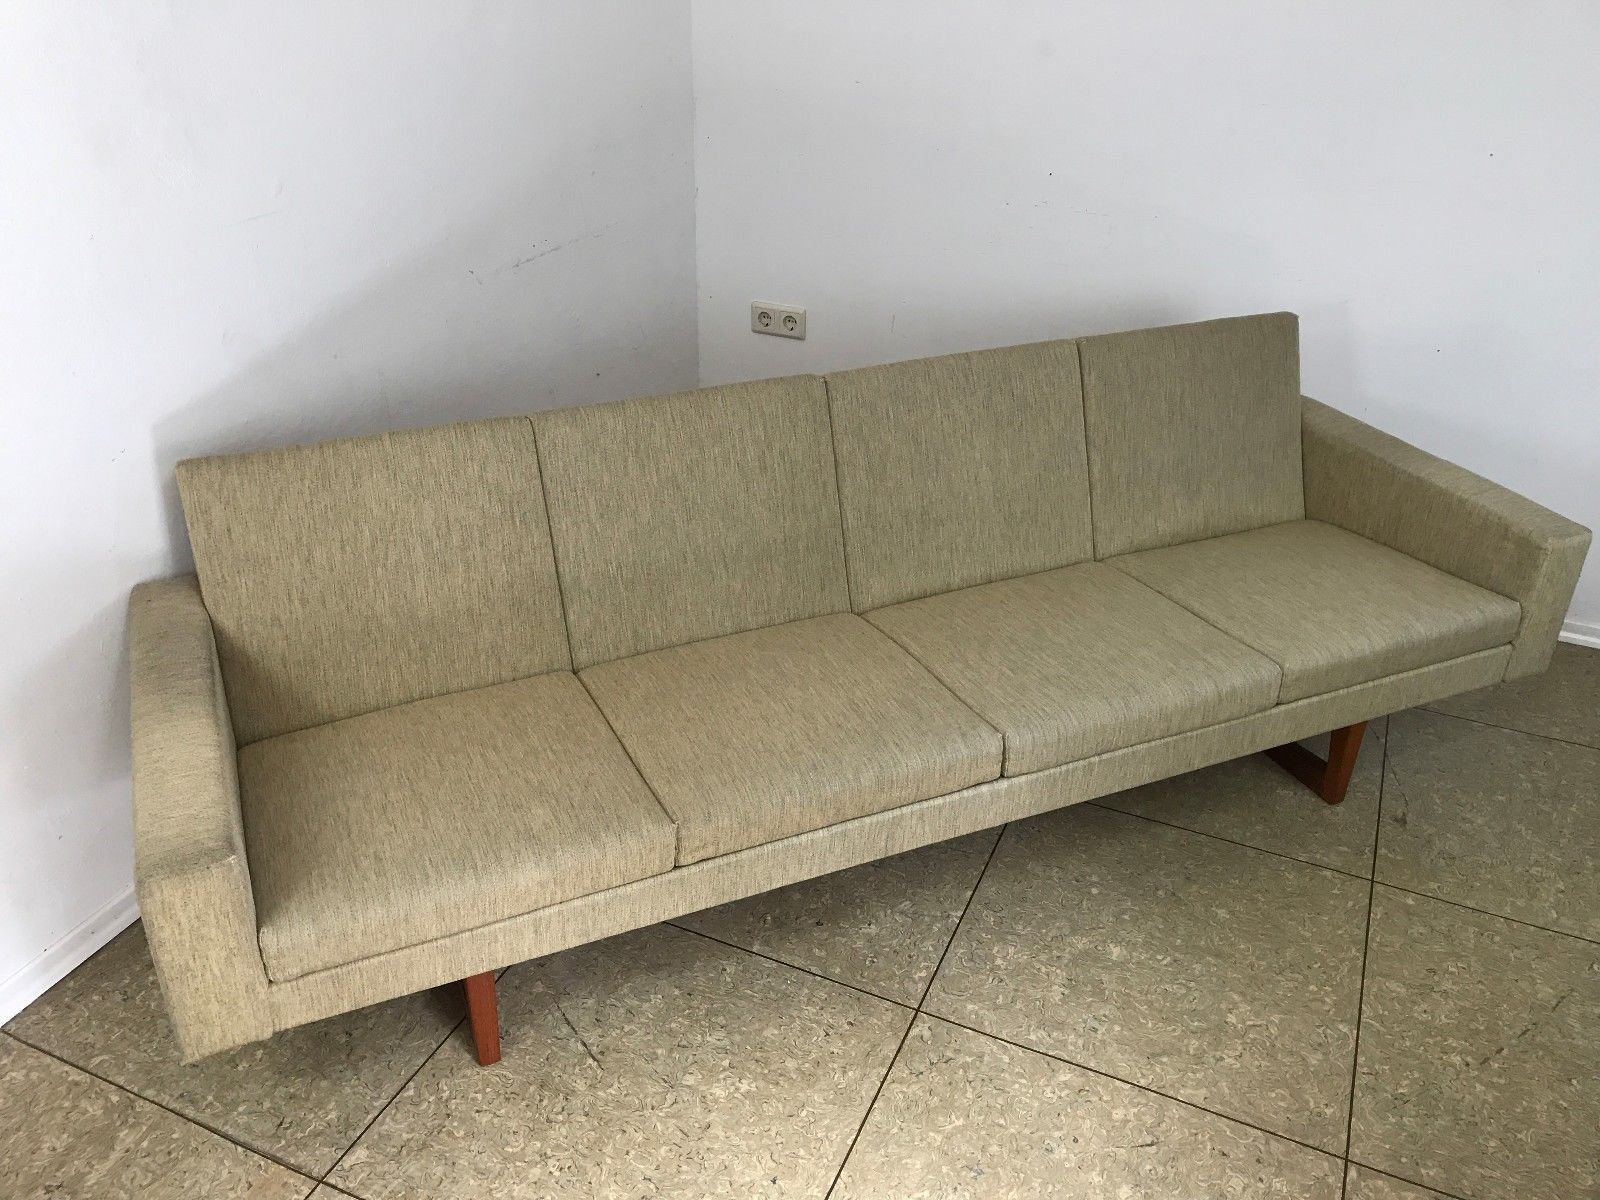 Teak Sofa by Ingvar Andersson for Effk¥ Swedish 1960s for sale at